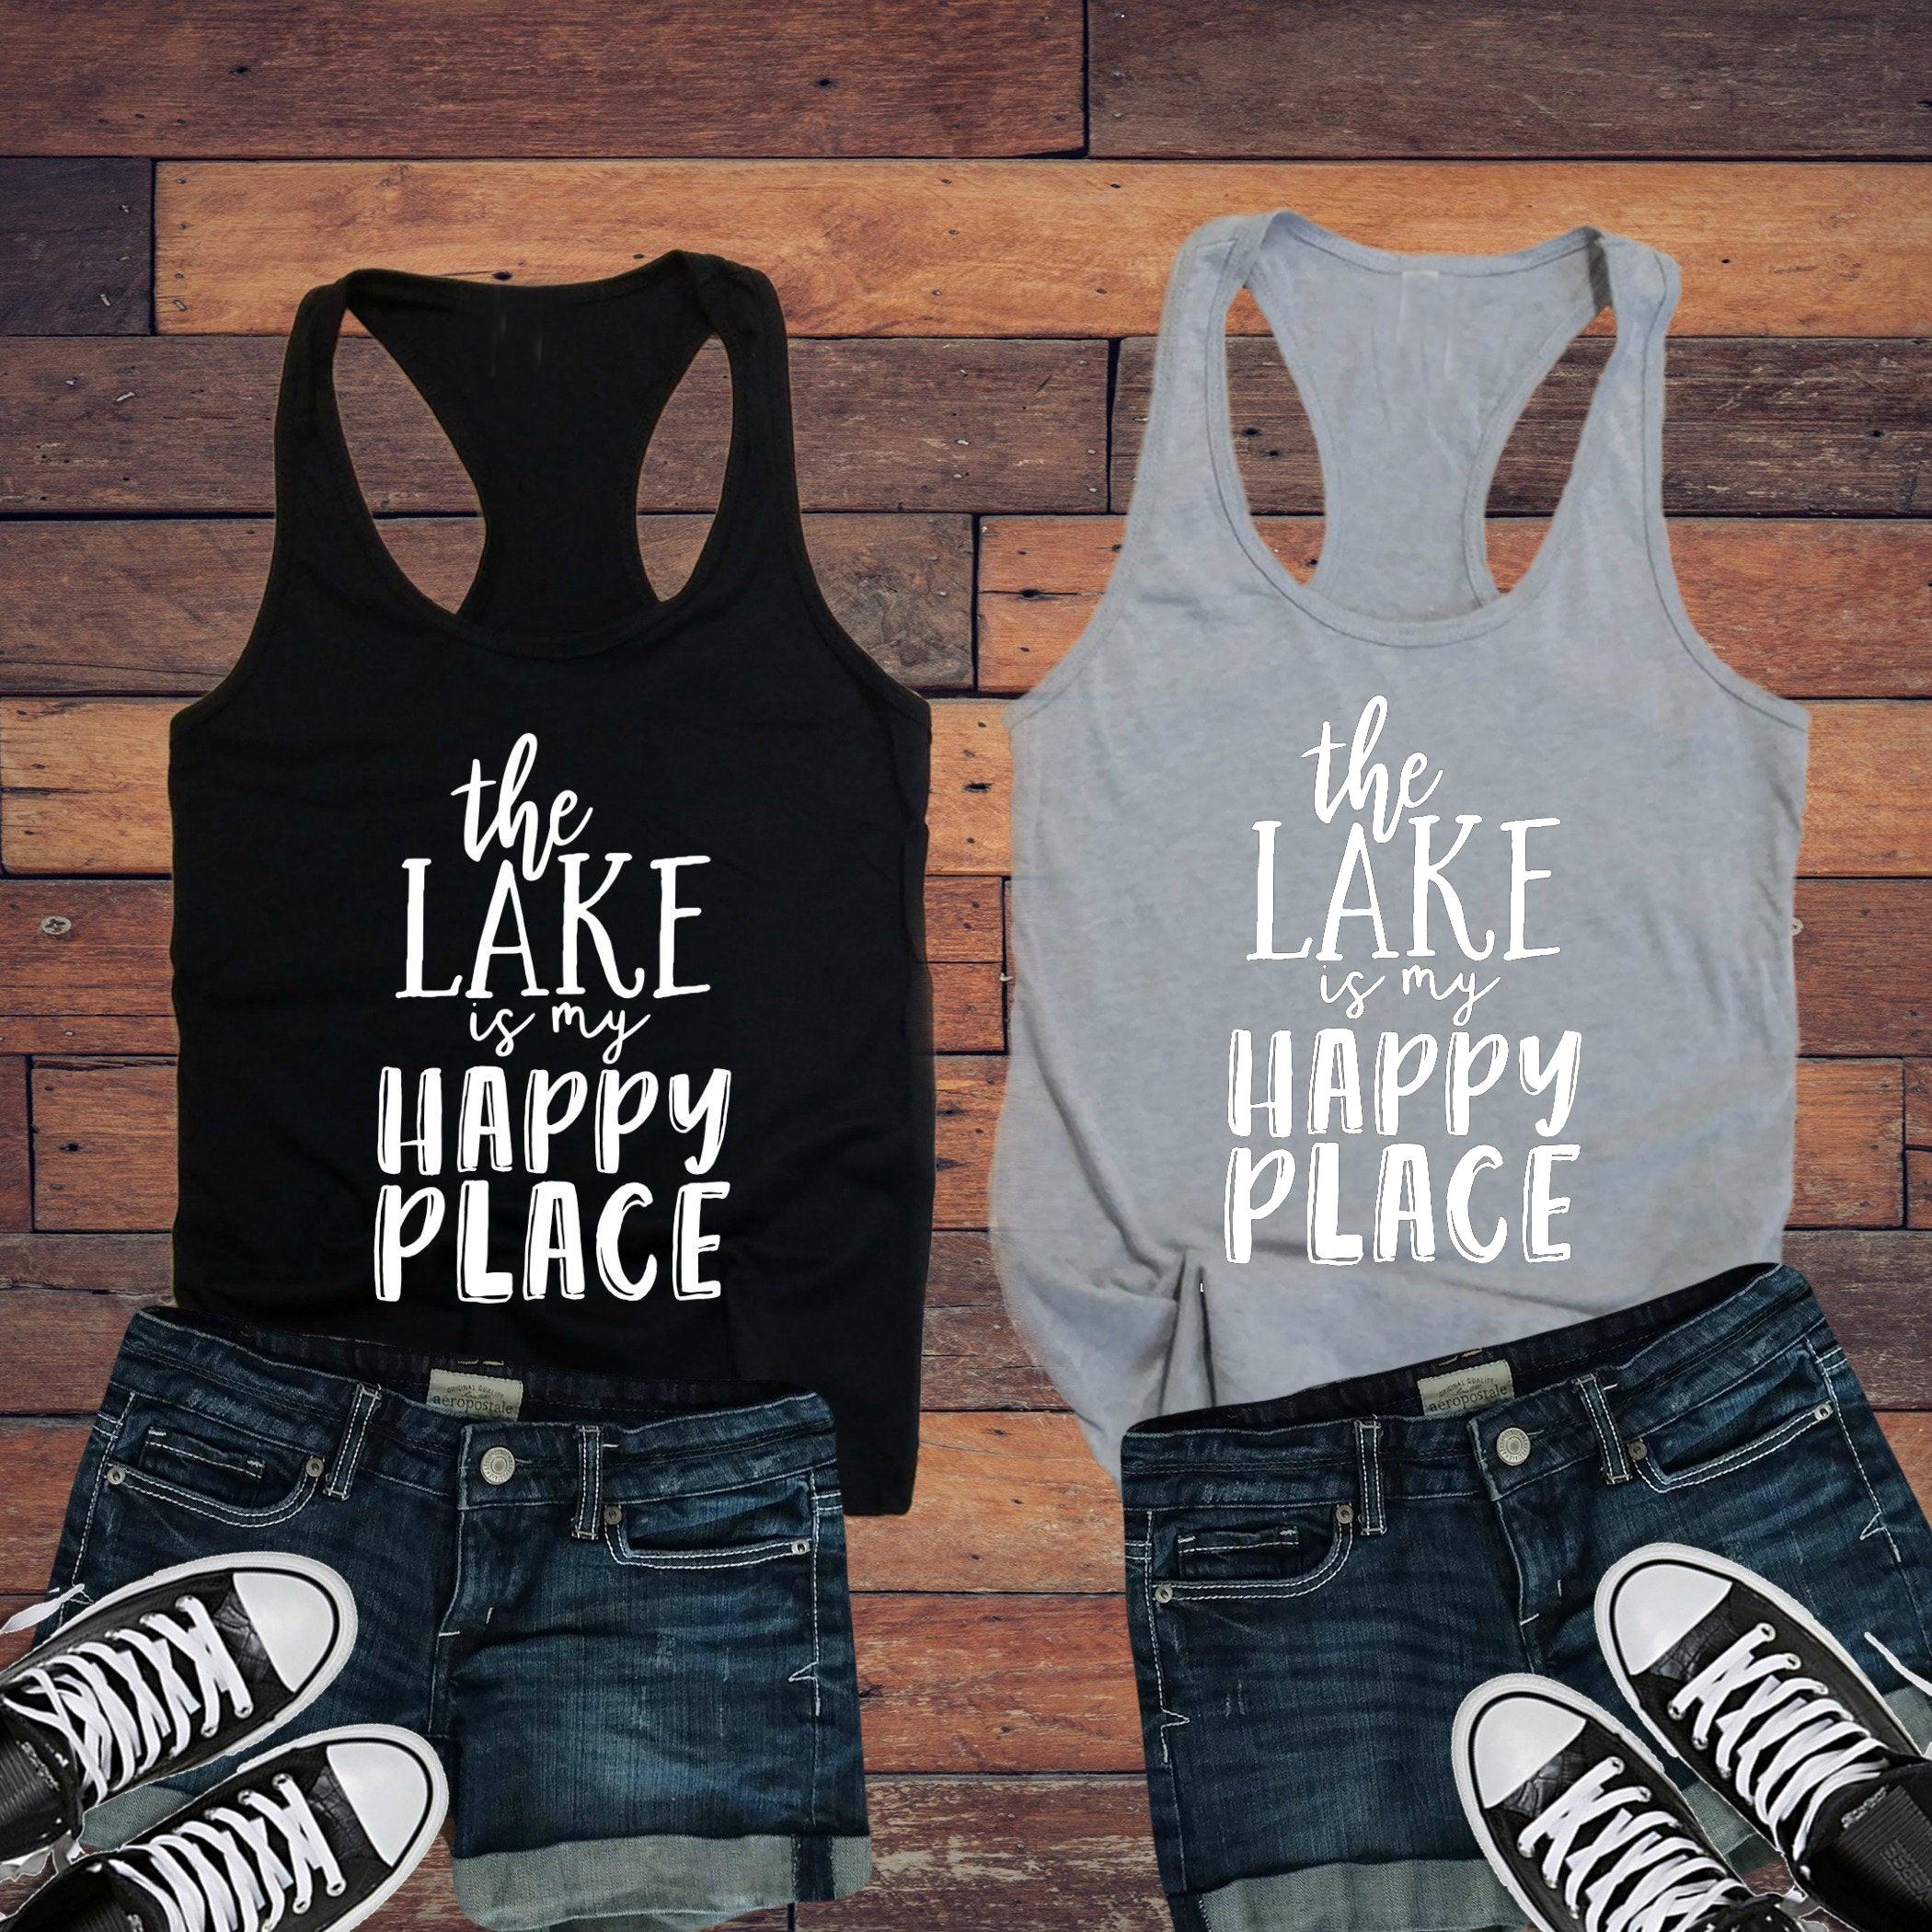 Divertida aventura lema Grunge Tumblr chaleco camiseta Goth camiseta sin mangas Ropa El lago es mi lugar feliz señoras camiseta sin mangas